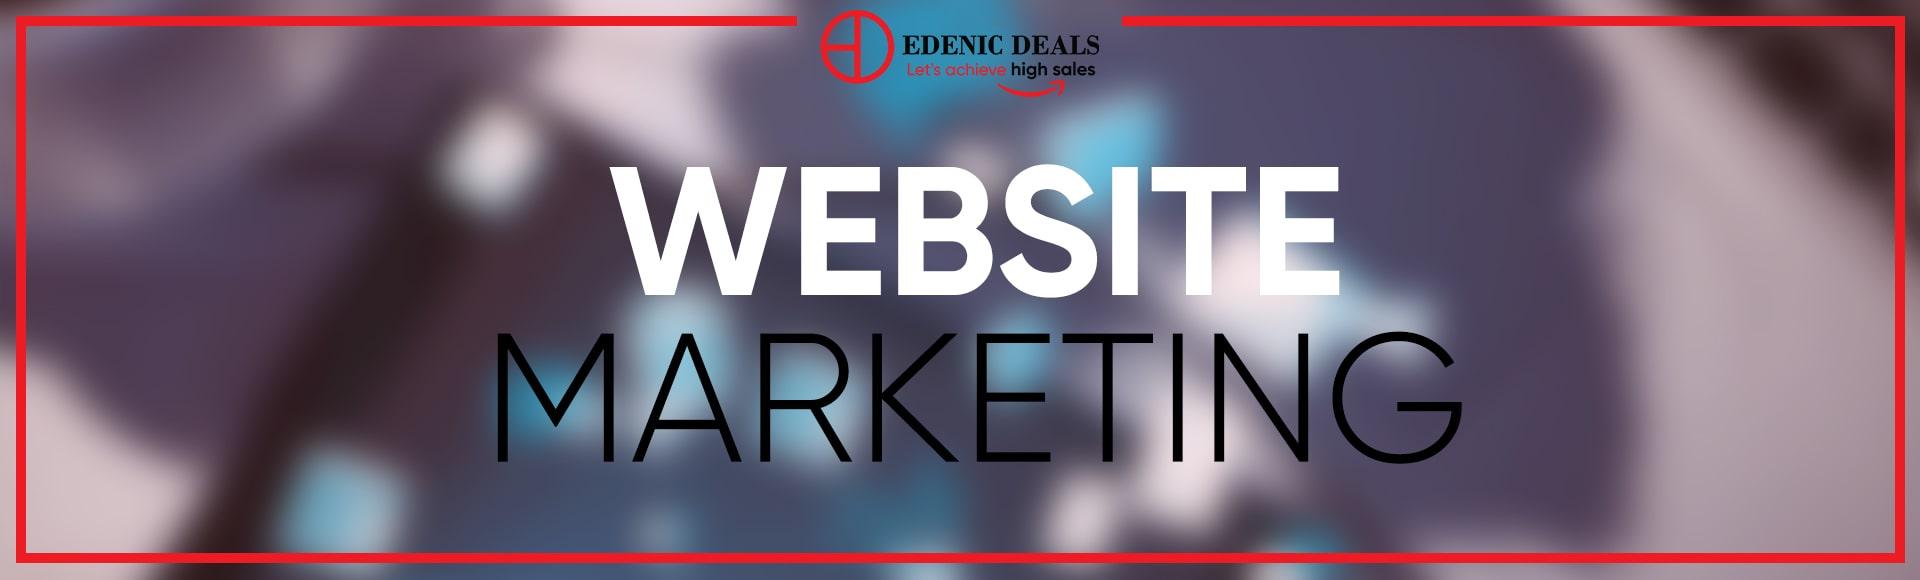 Edenic Deals Website Marketing